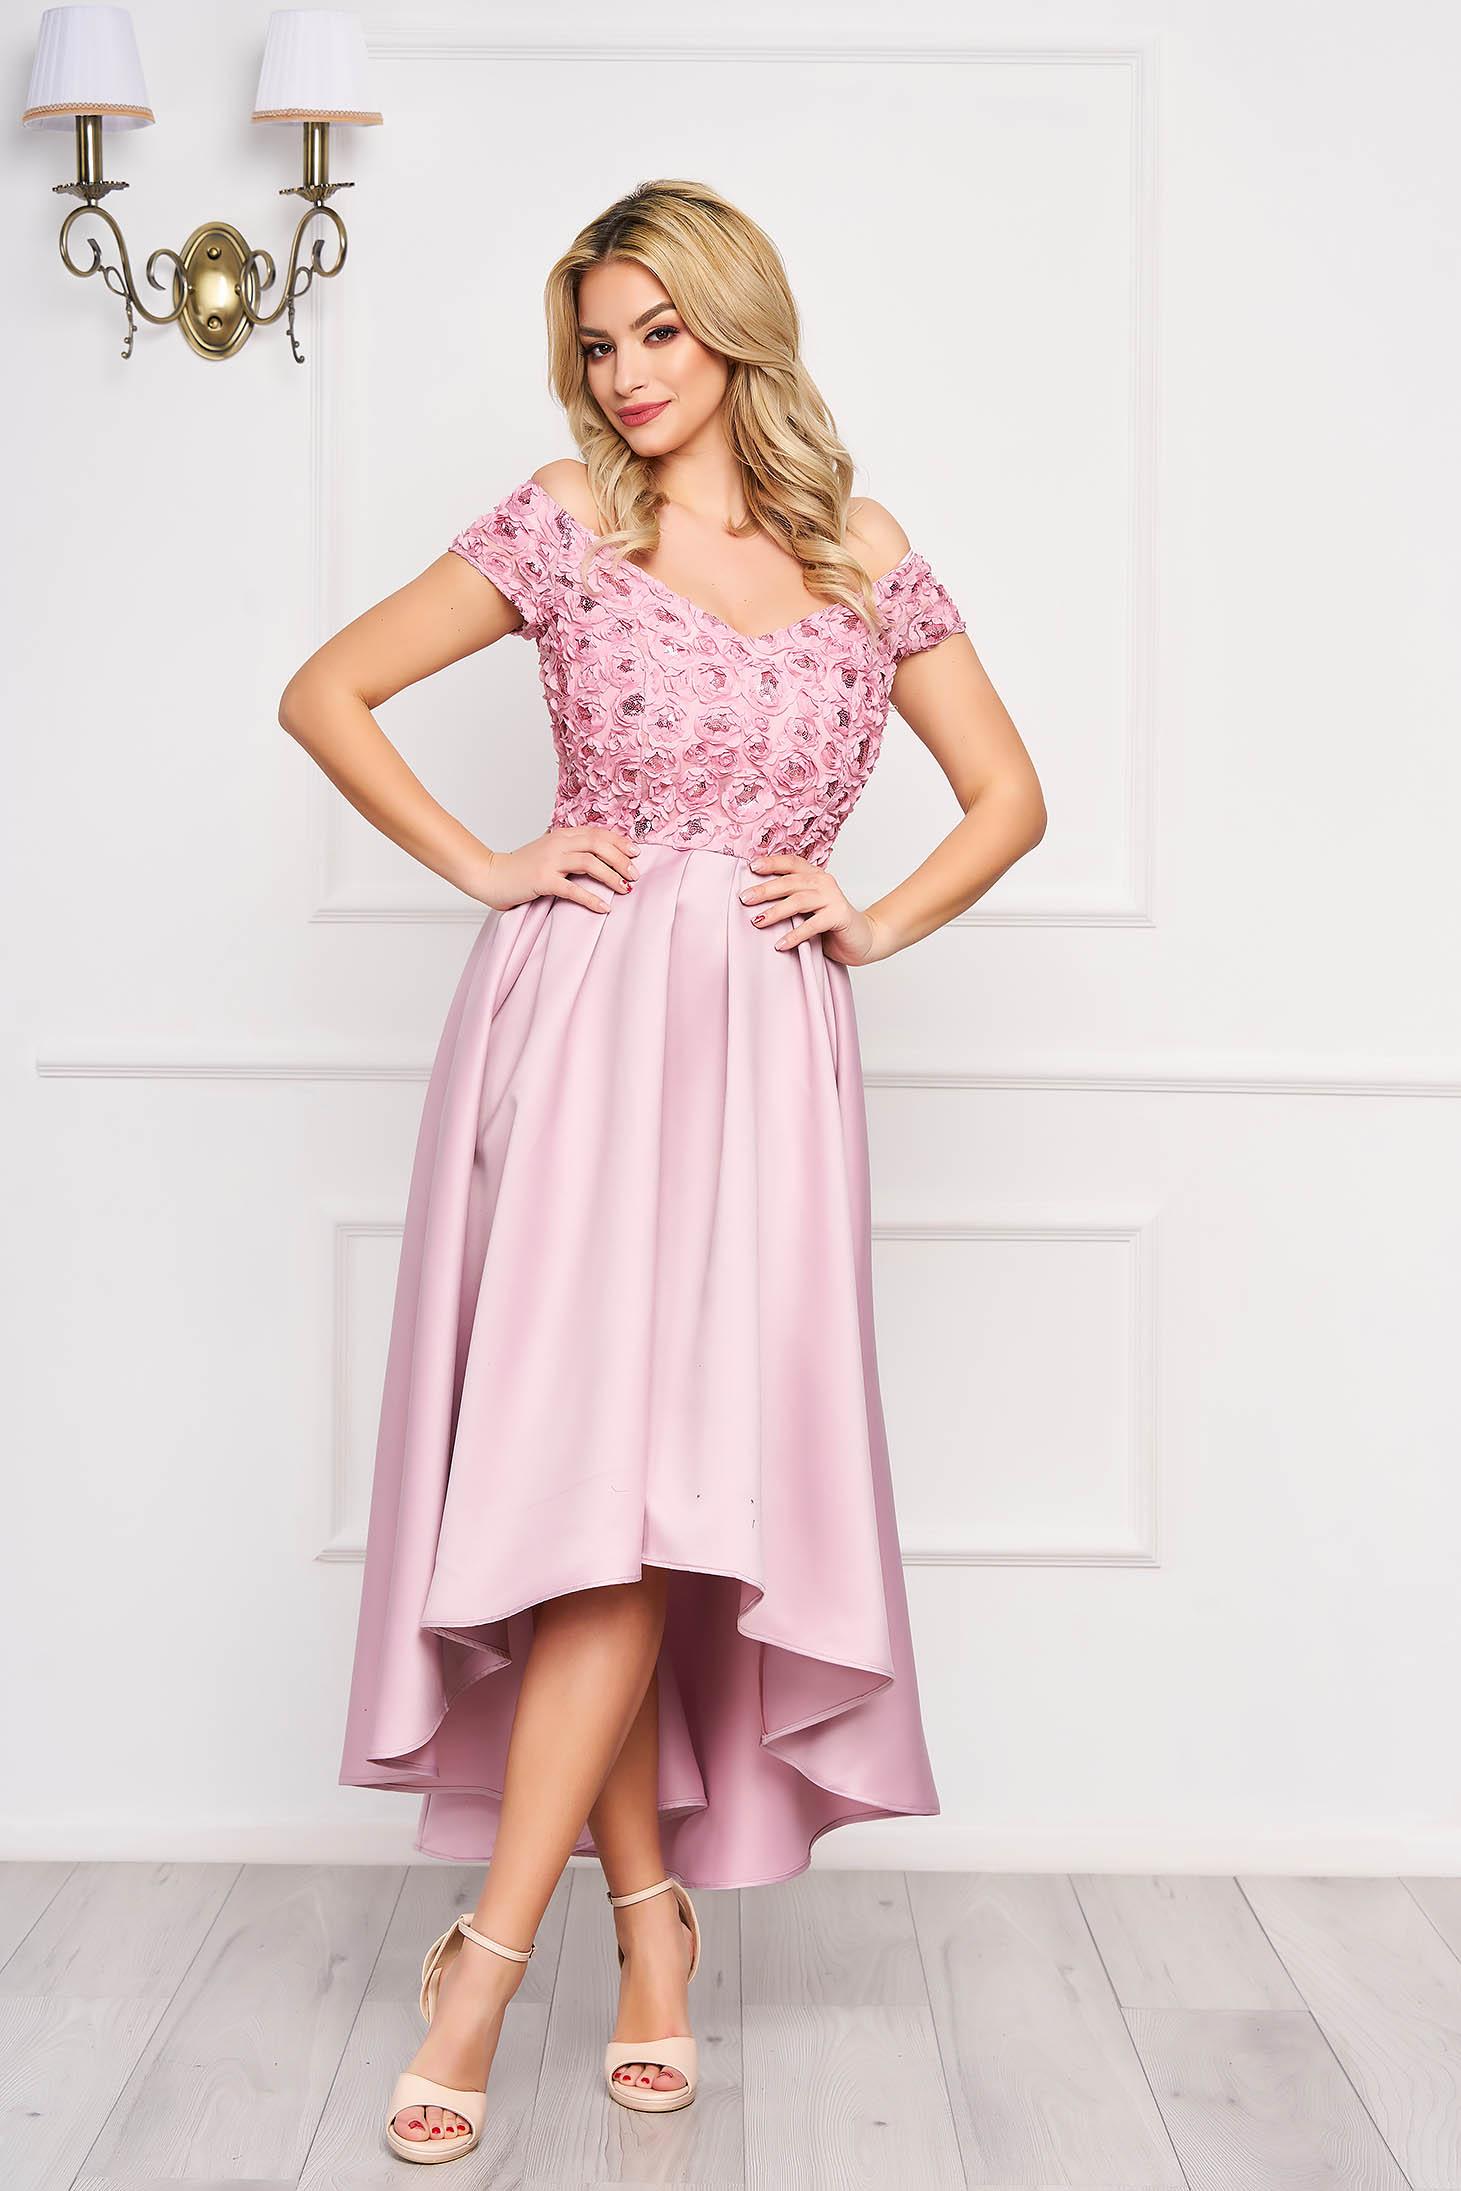 Rochie StarShinerS roz prafuit asimetrica de ocazie din satin cu umeri goi si aplicatii cu paiete